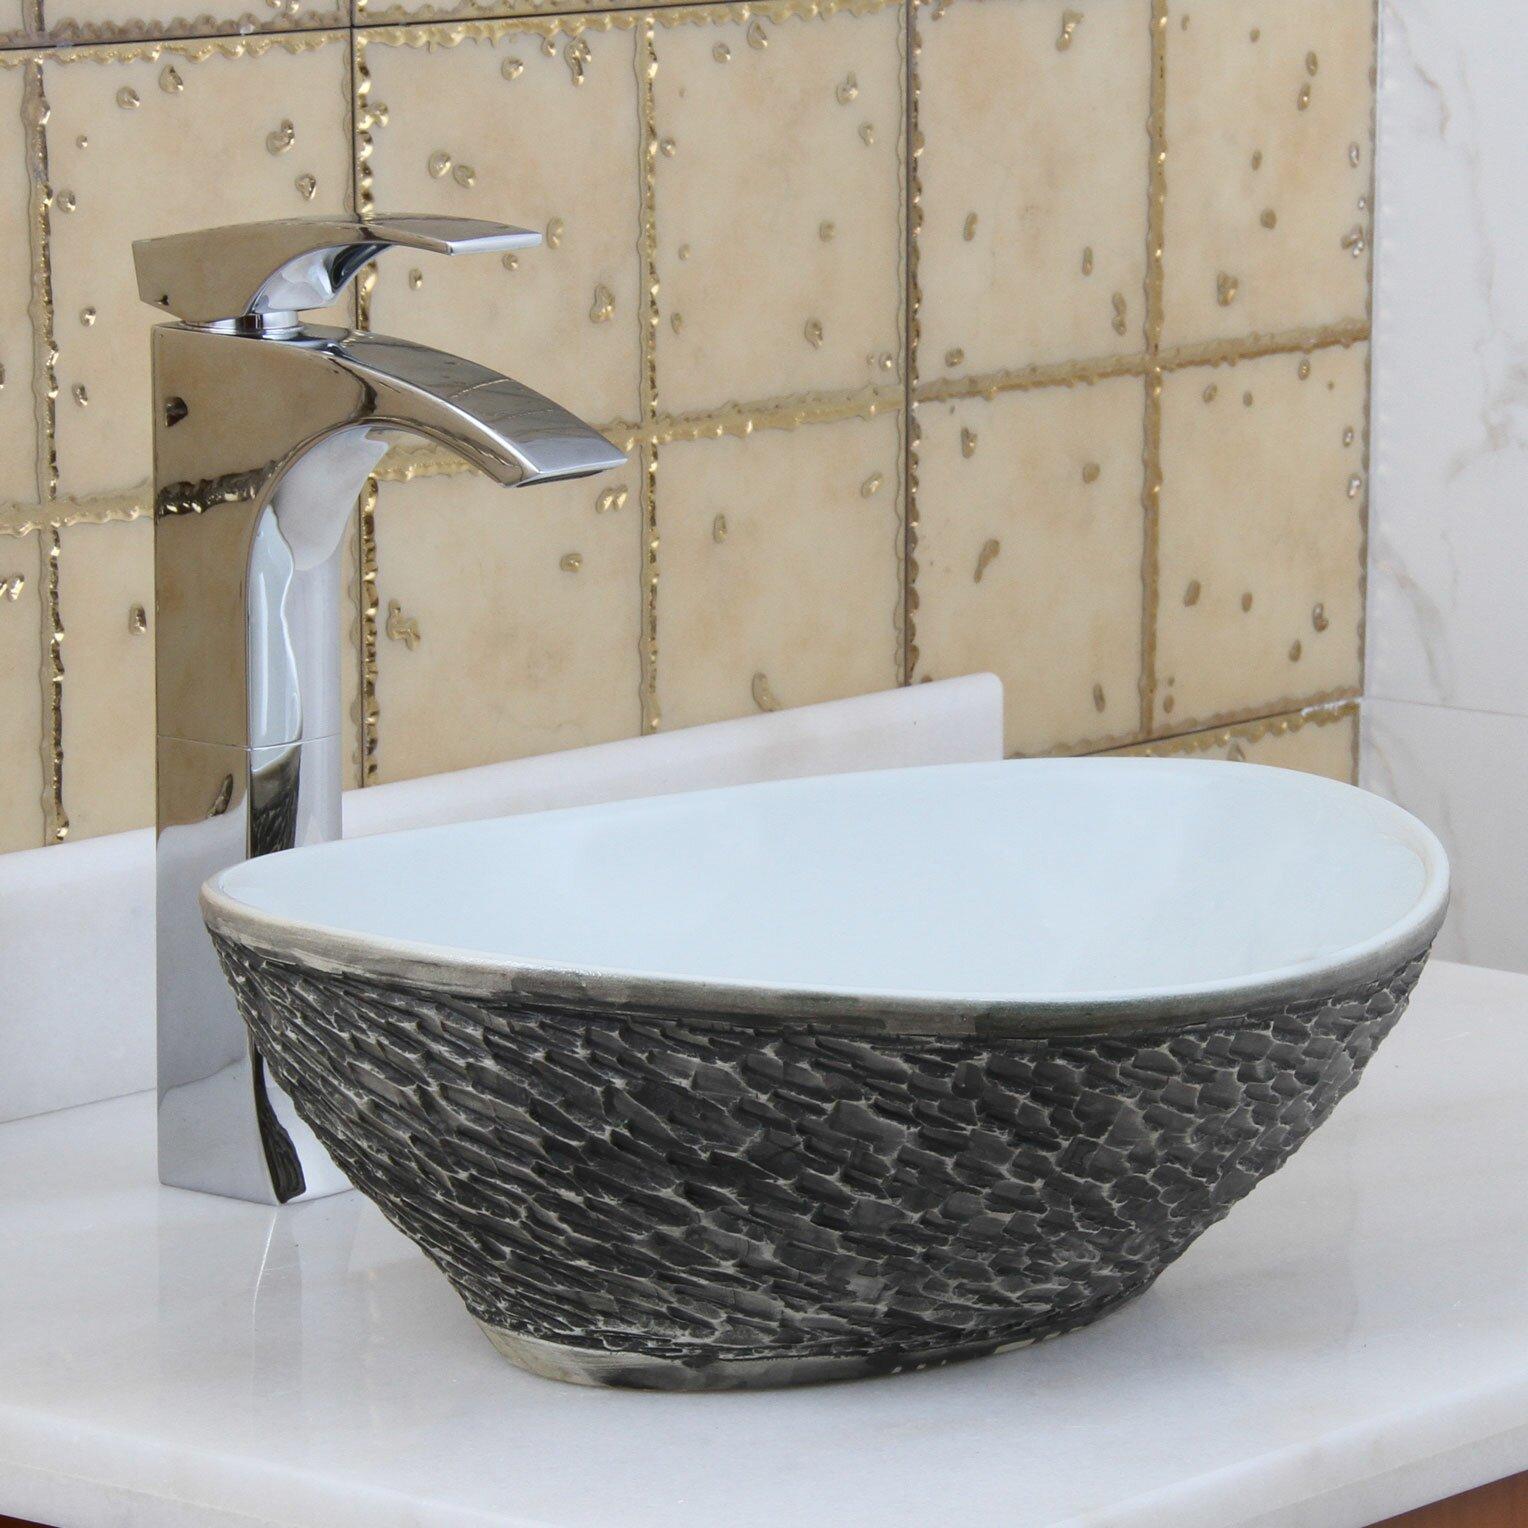 Rock Bathroom Sink : Elite Natural Rock Vessel Bathroom Sink by Elimaxs